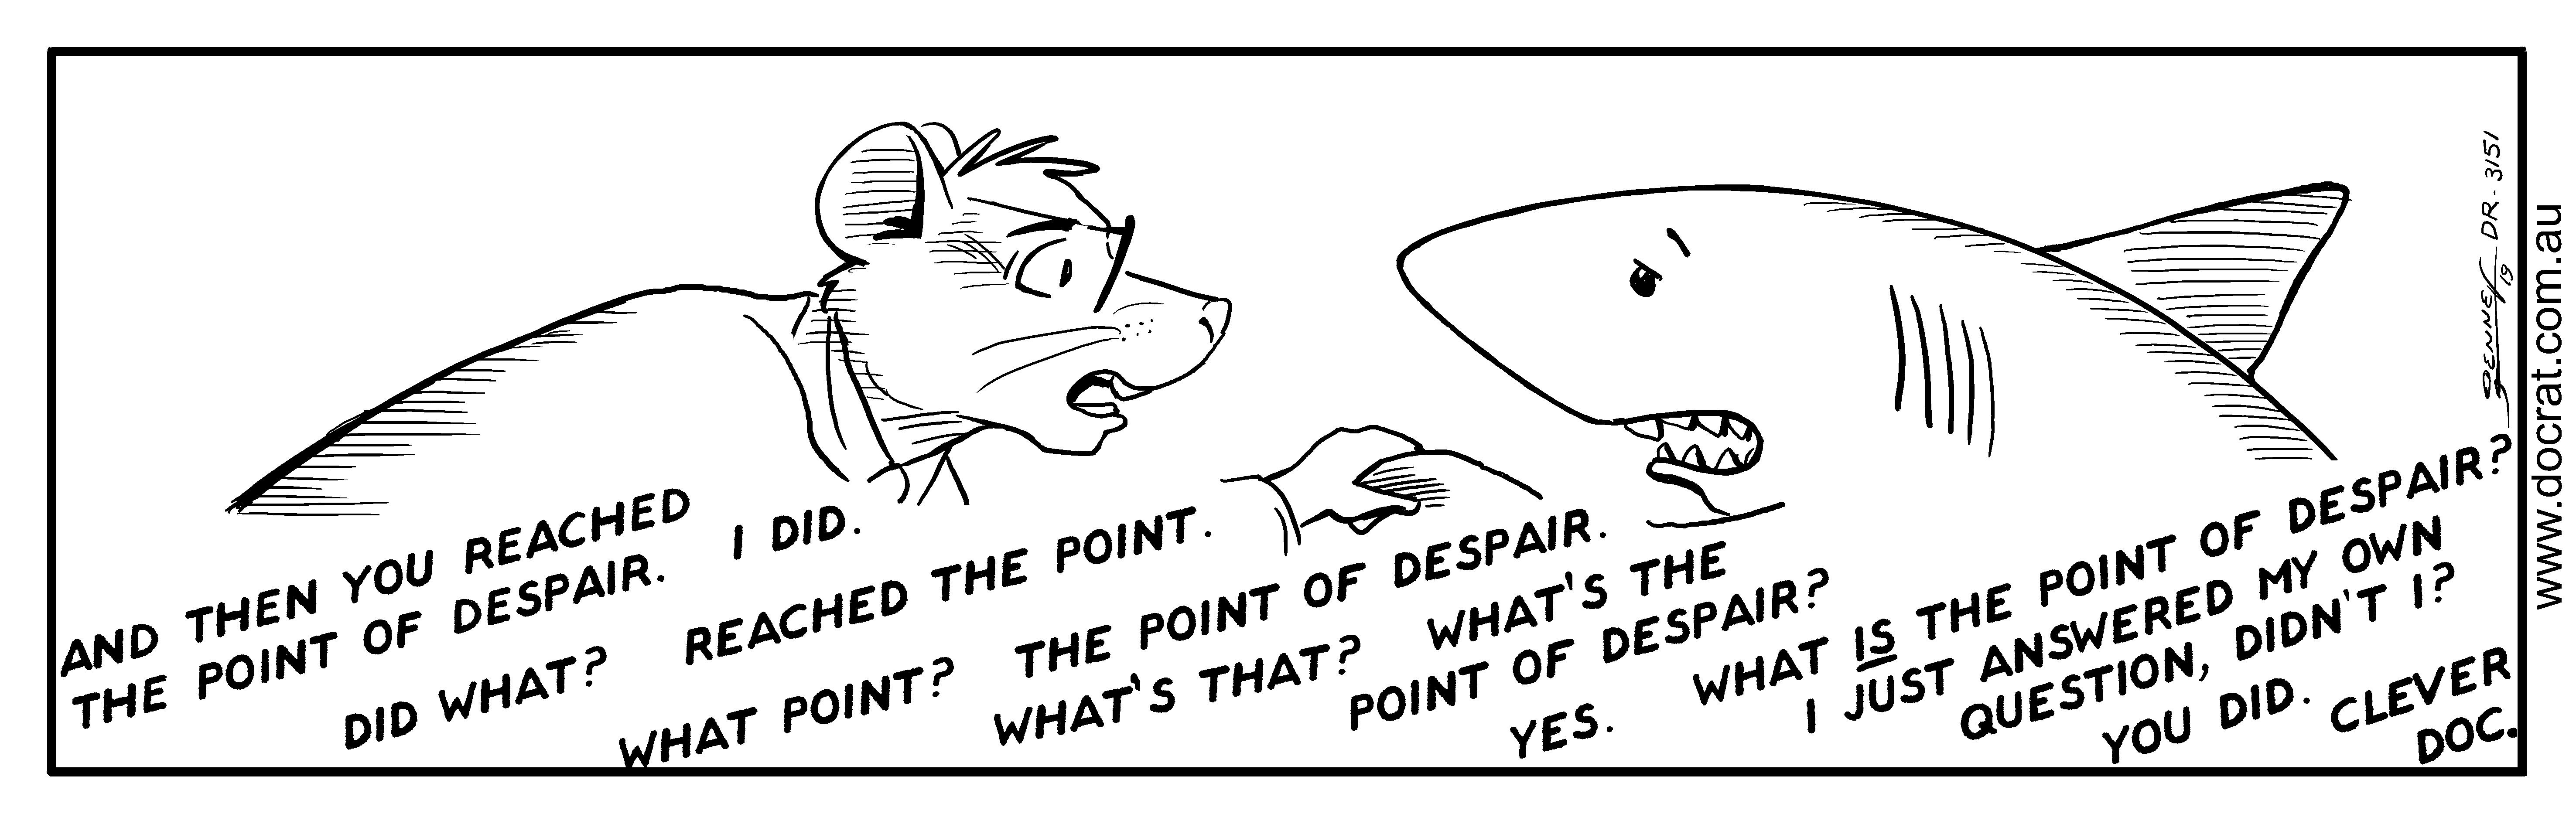 20190107